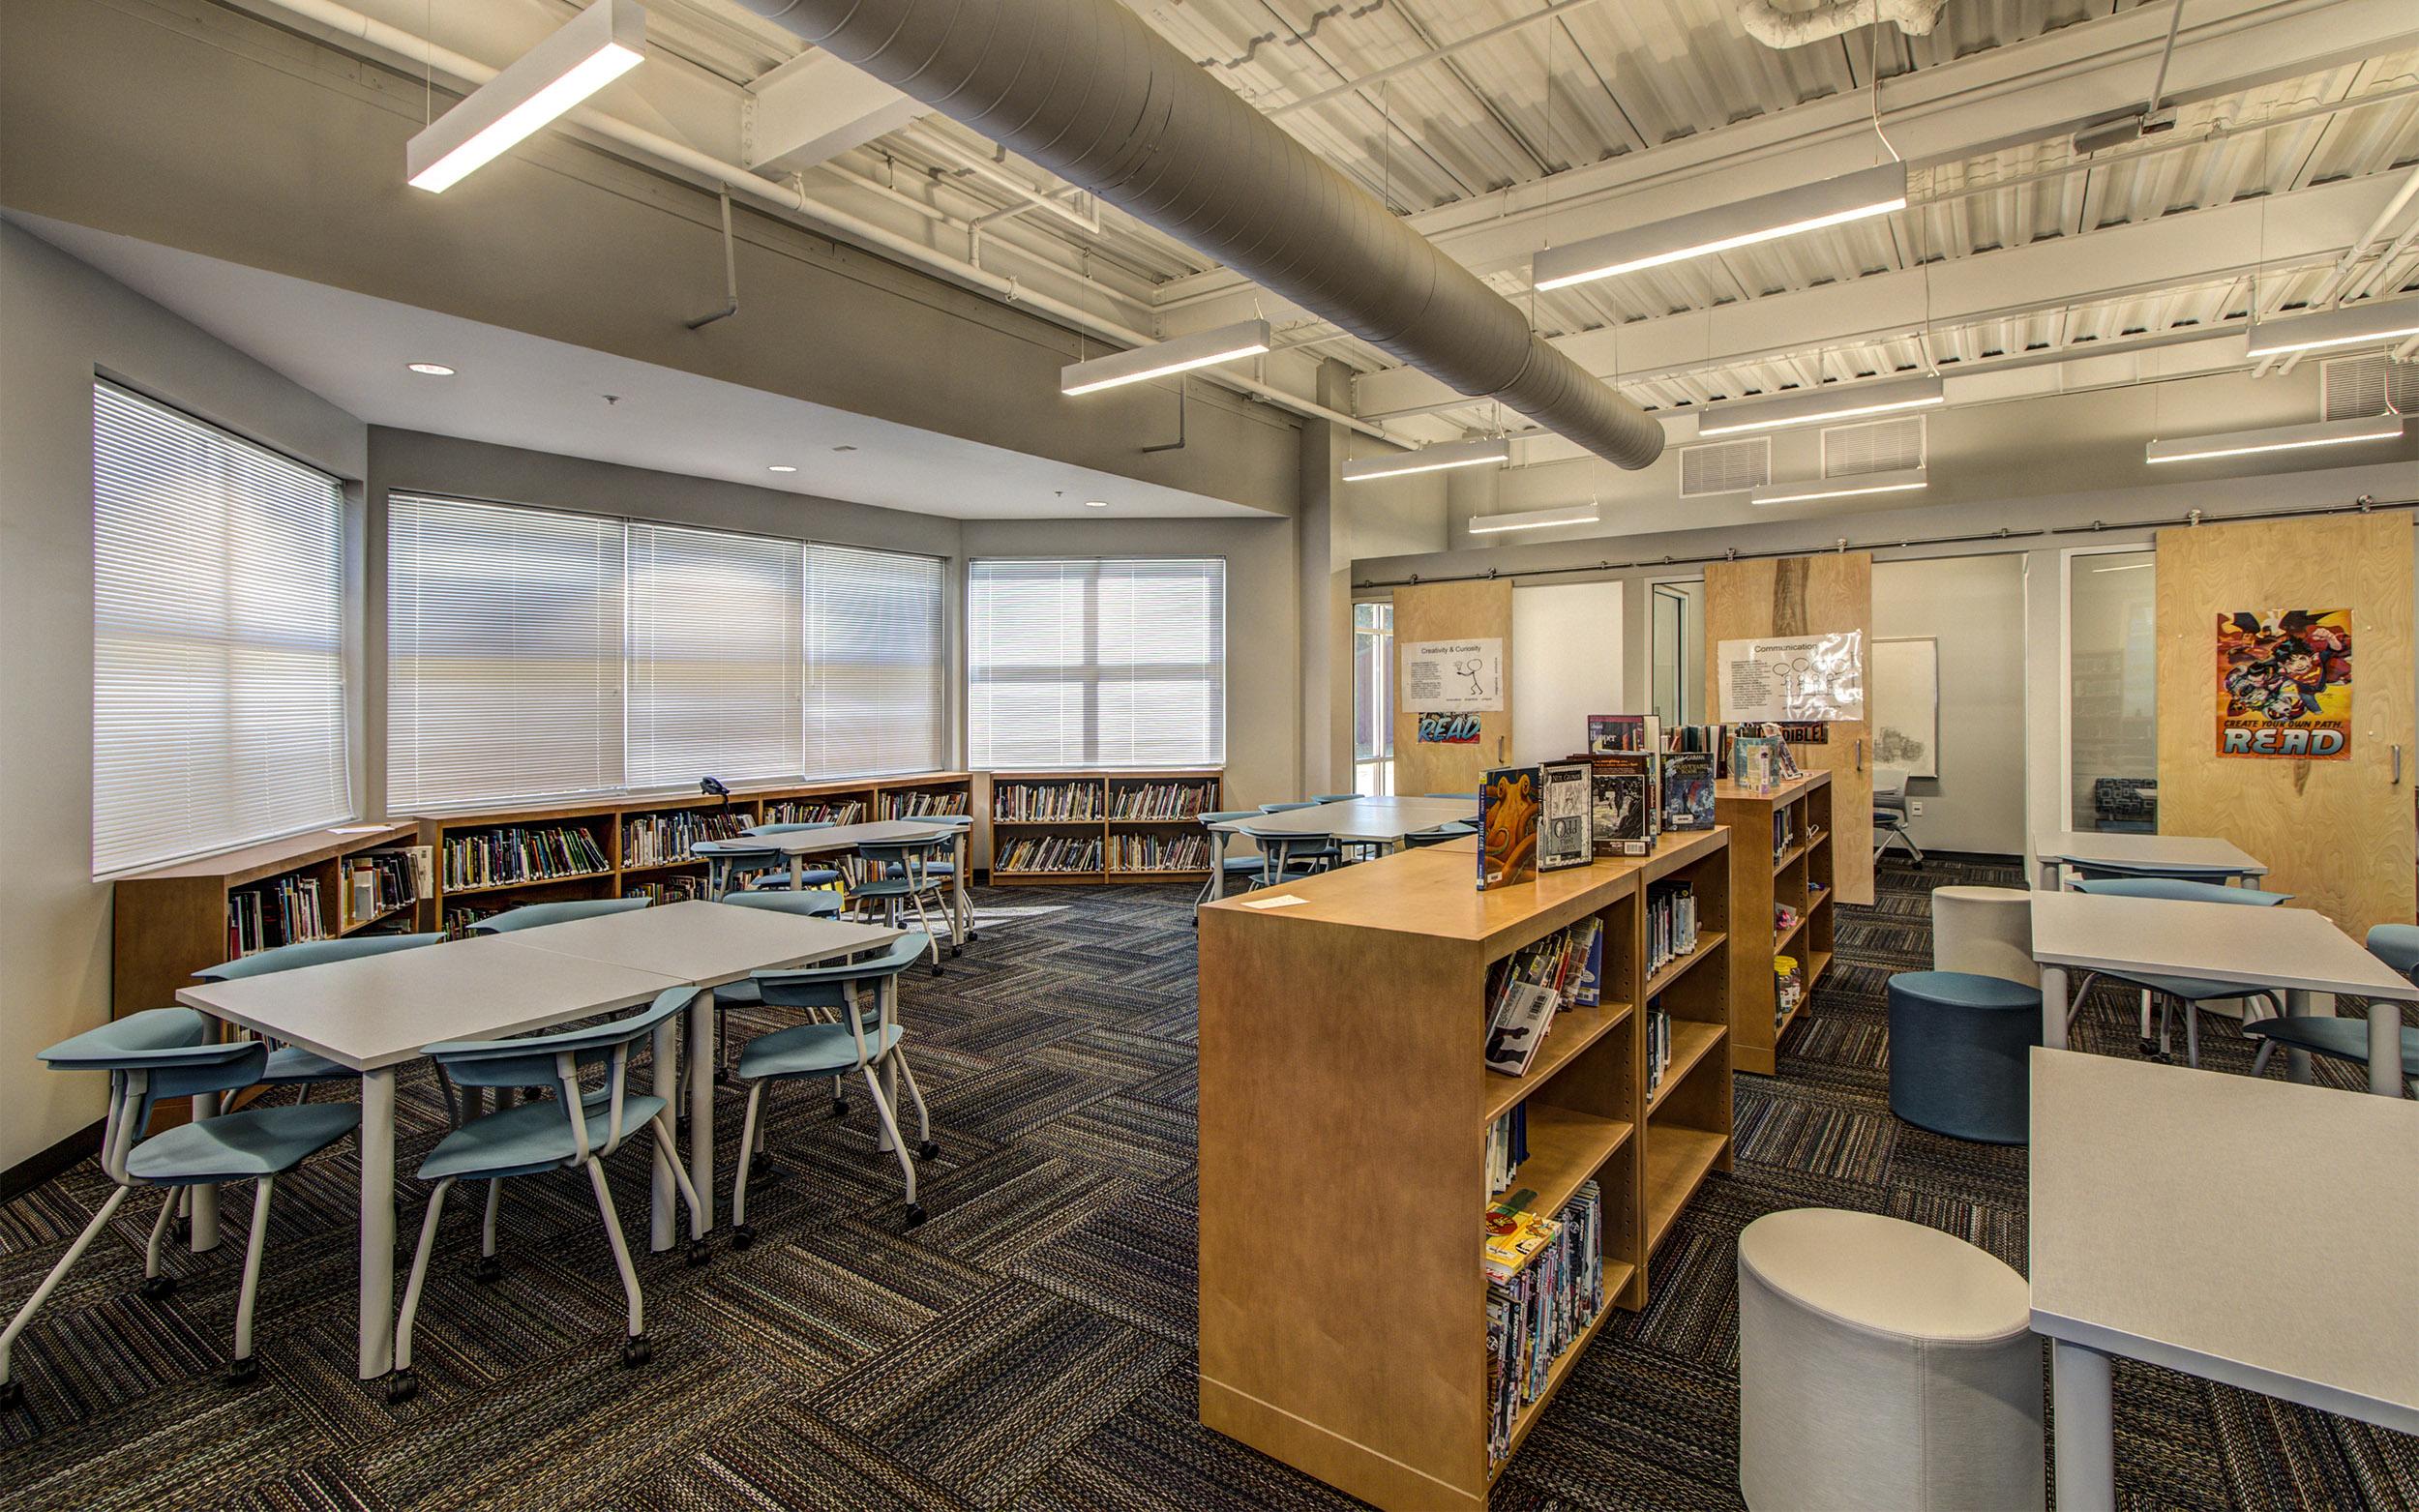 Cannon School 7-8th Grade Building